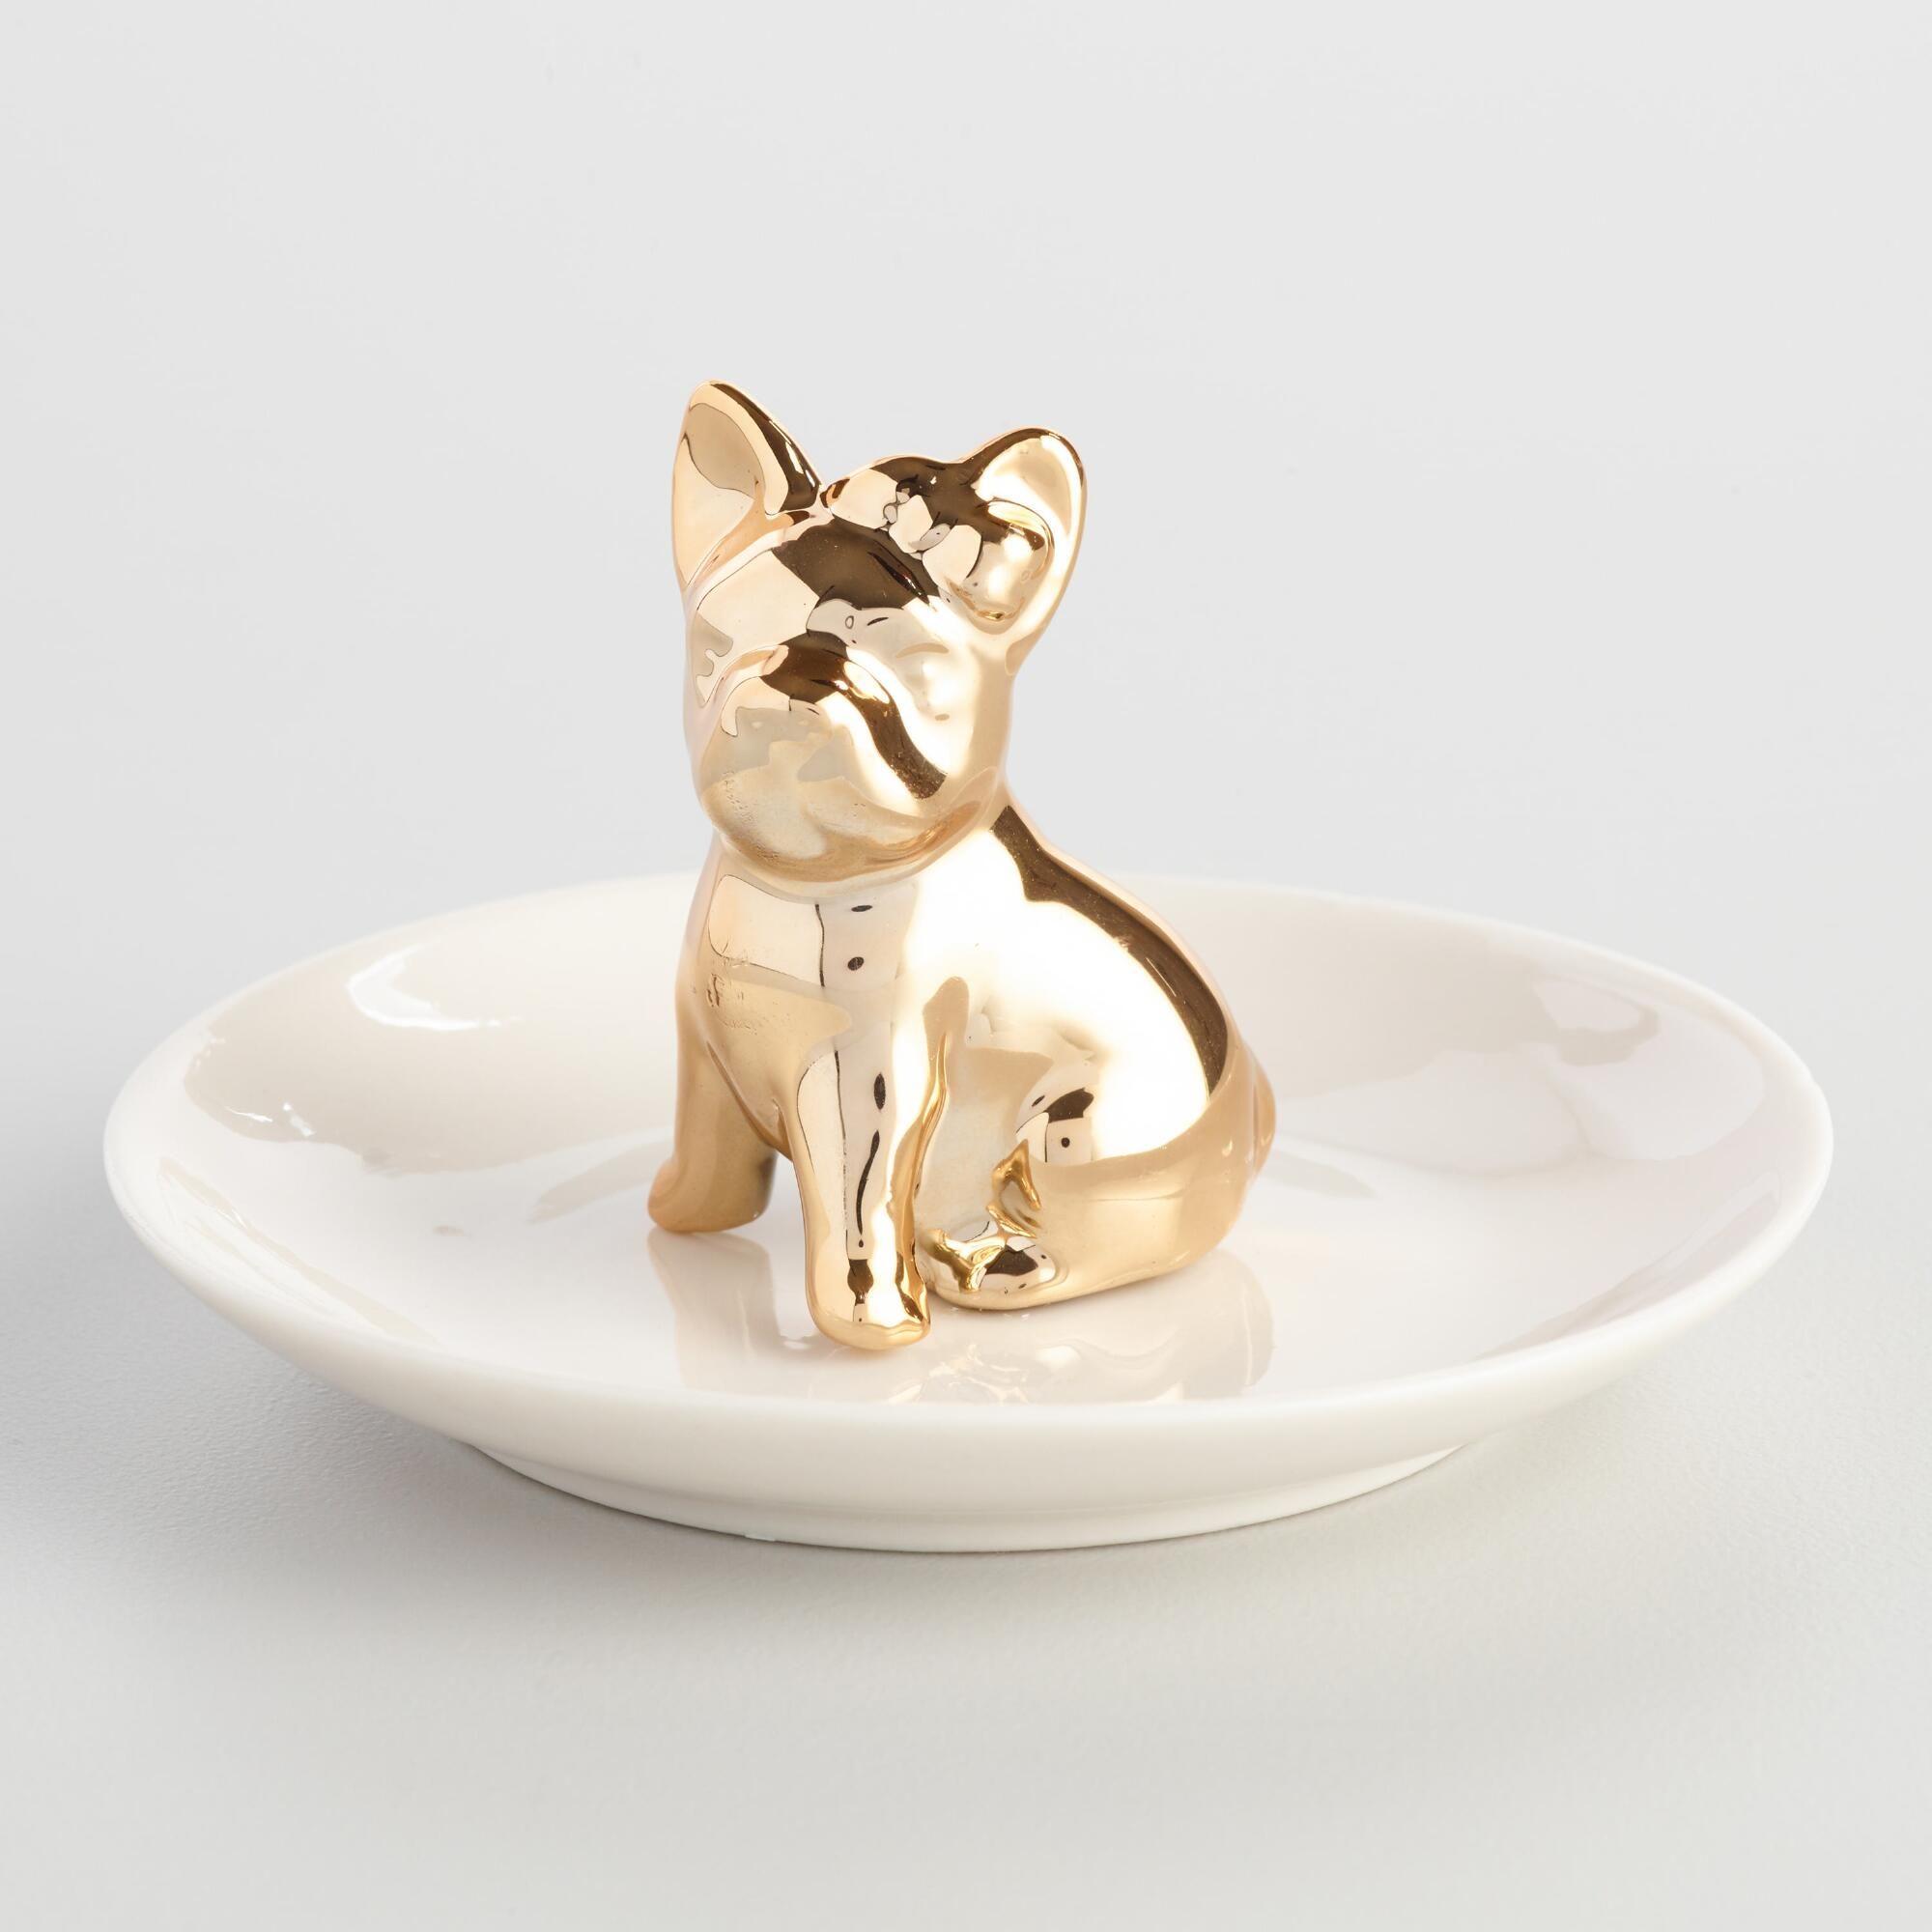 handmade ring holder terracotta pot terracotta clay gift Personalised trinket dish new home decor plant nerd inspirational gift